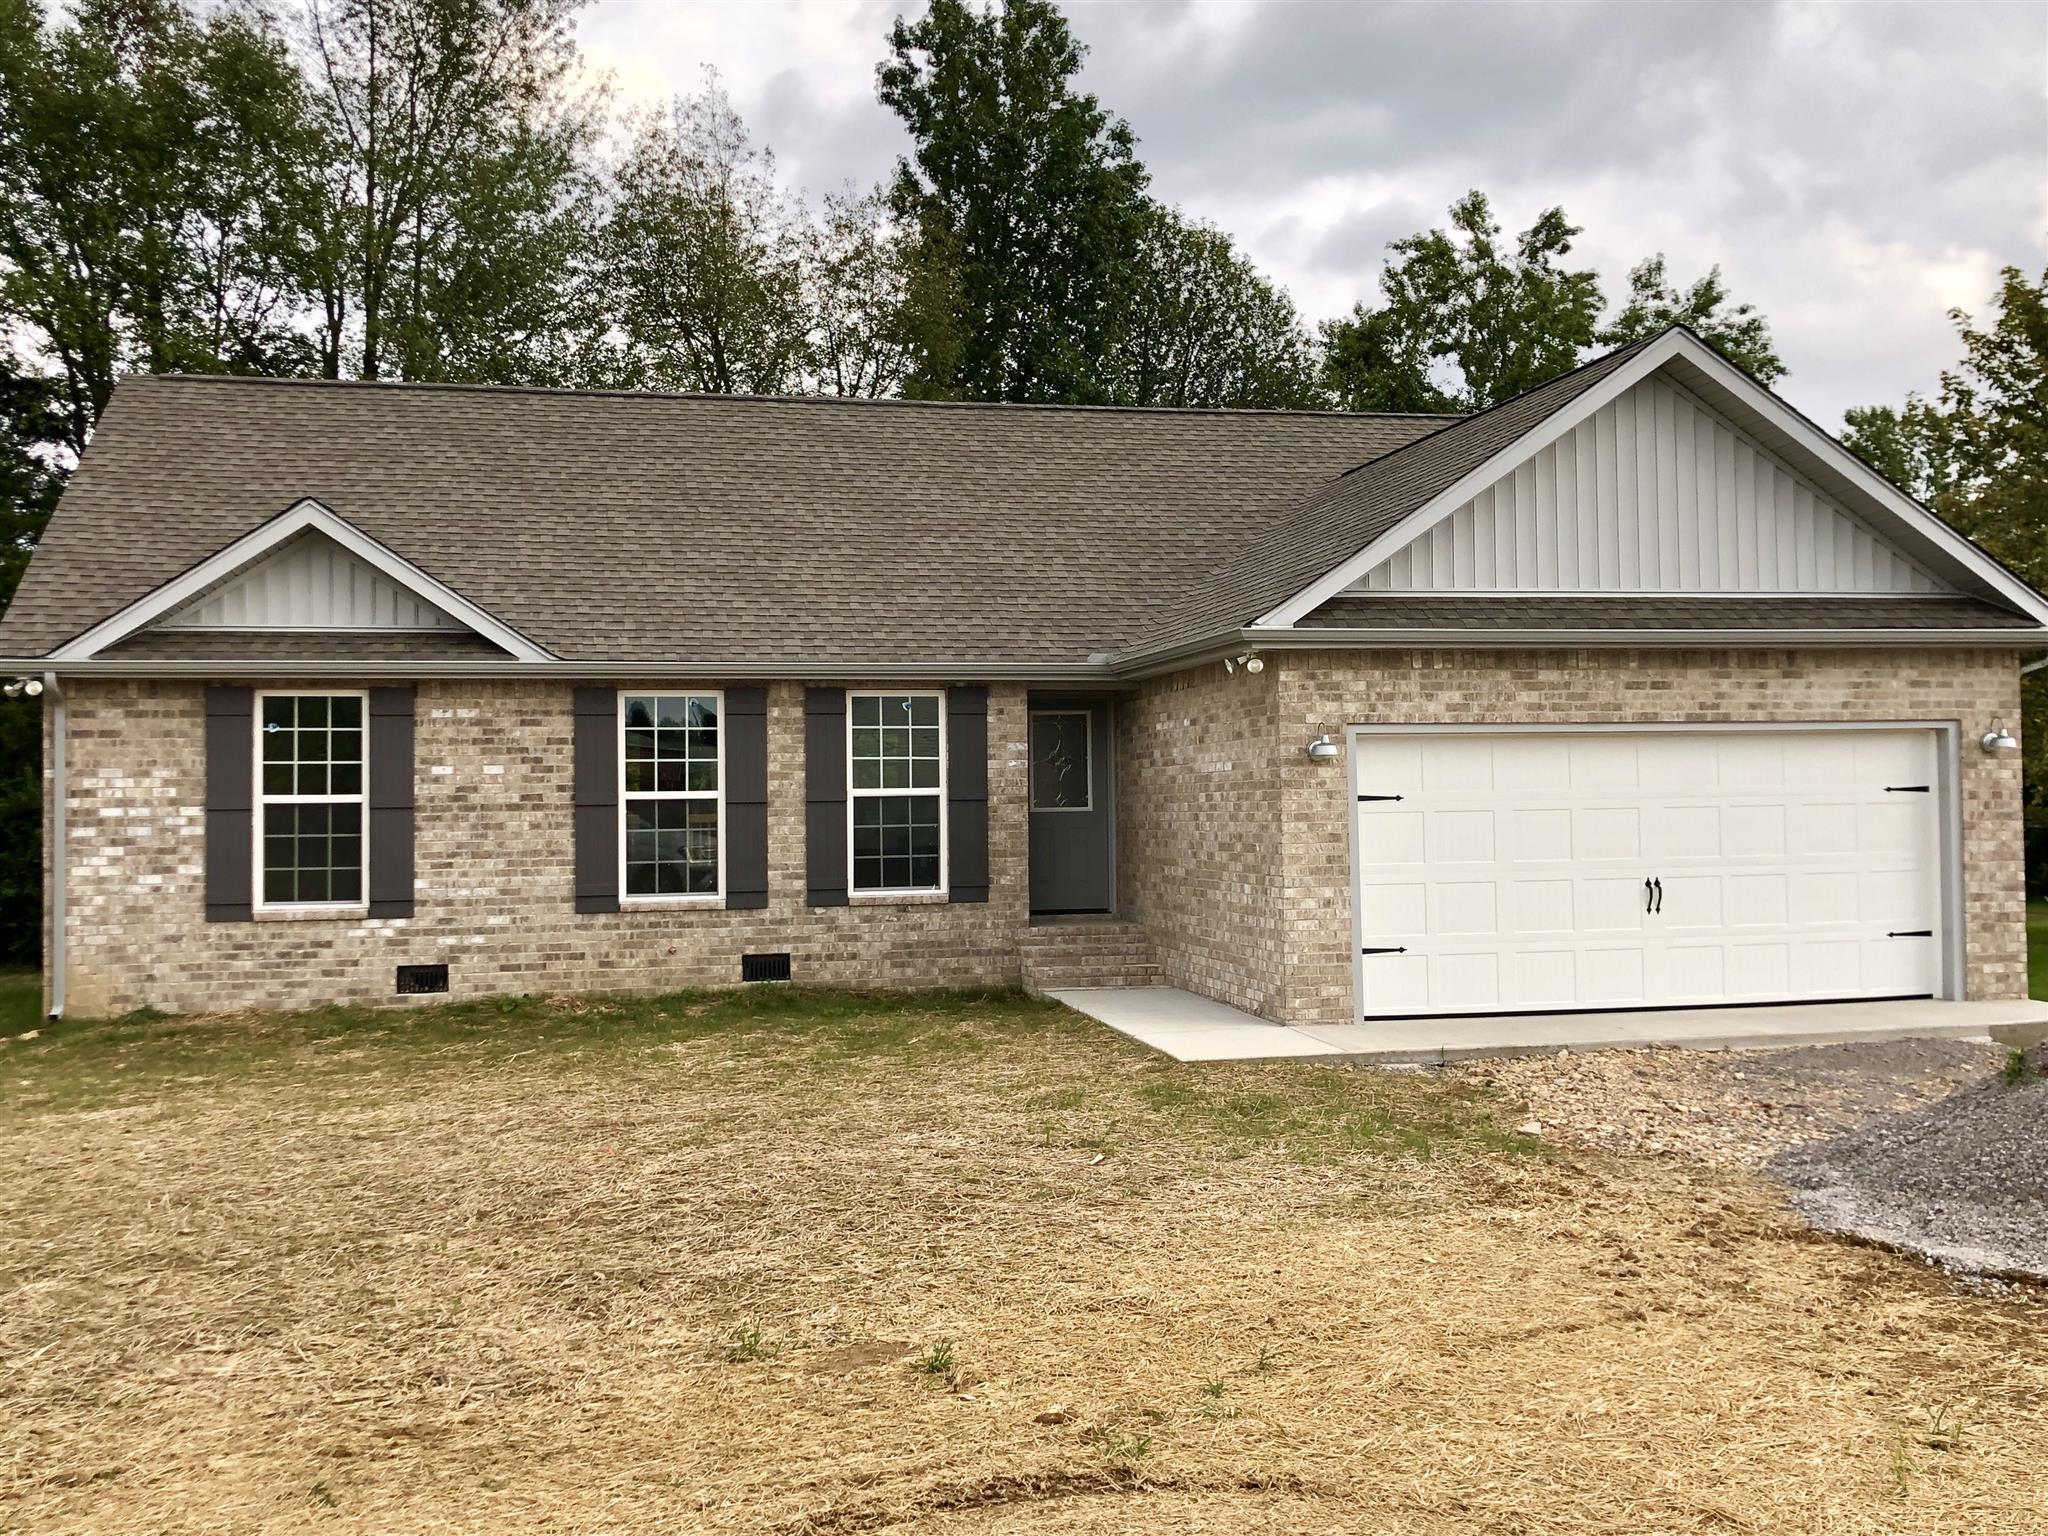 668 Kendra Dr, Smithville, TN 37166 - Smithville, TN real estate listing